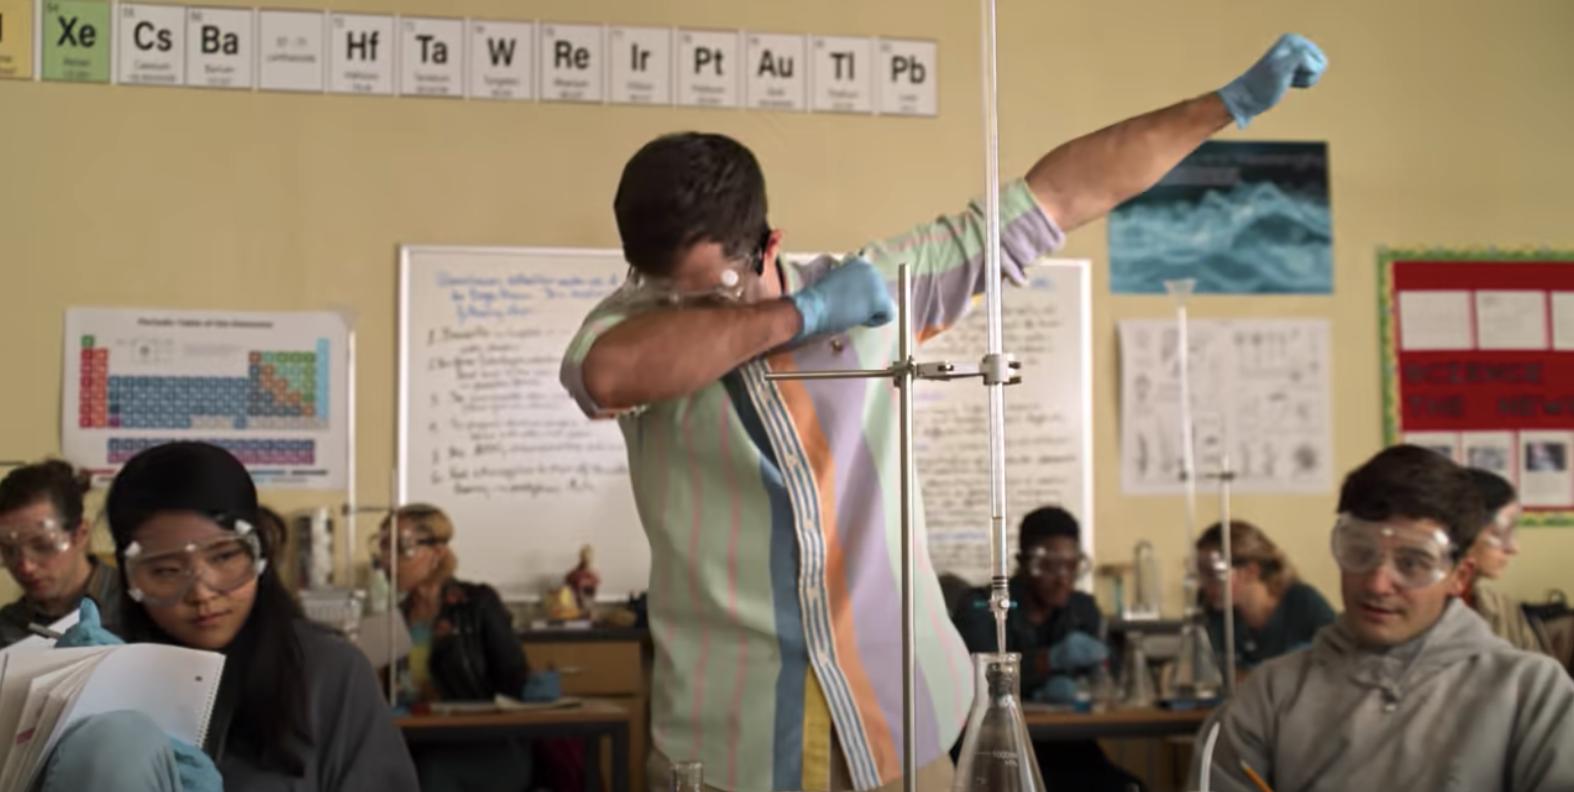 Ben Gross dabbing during science lab